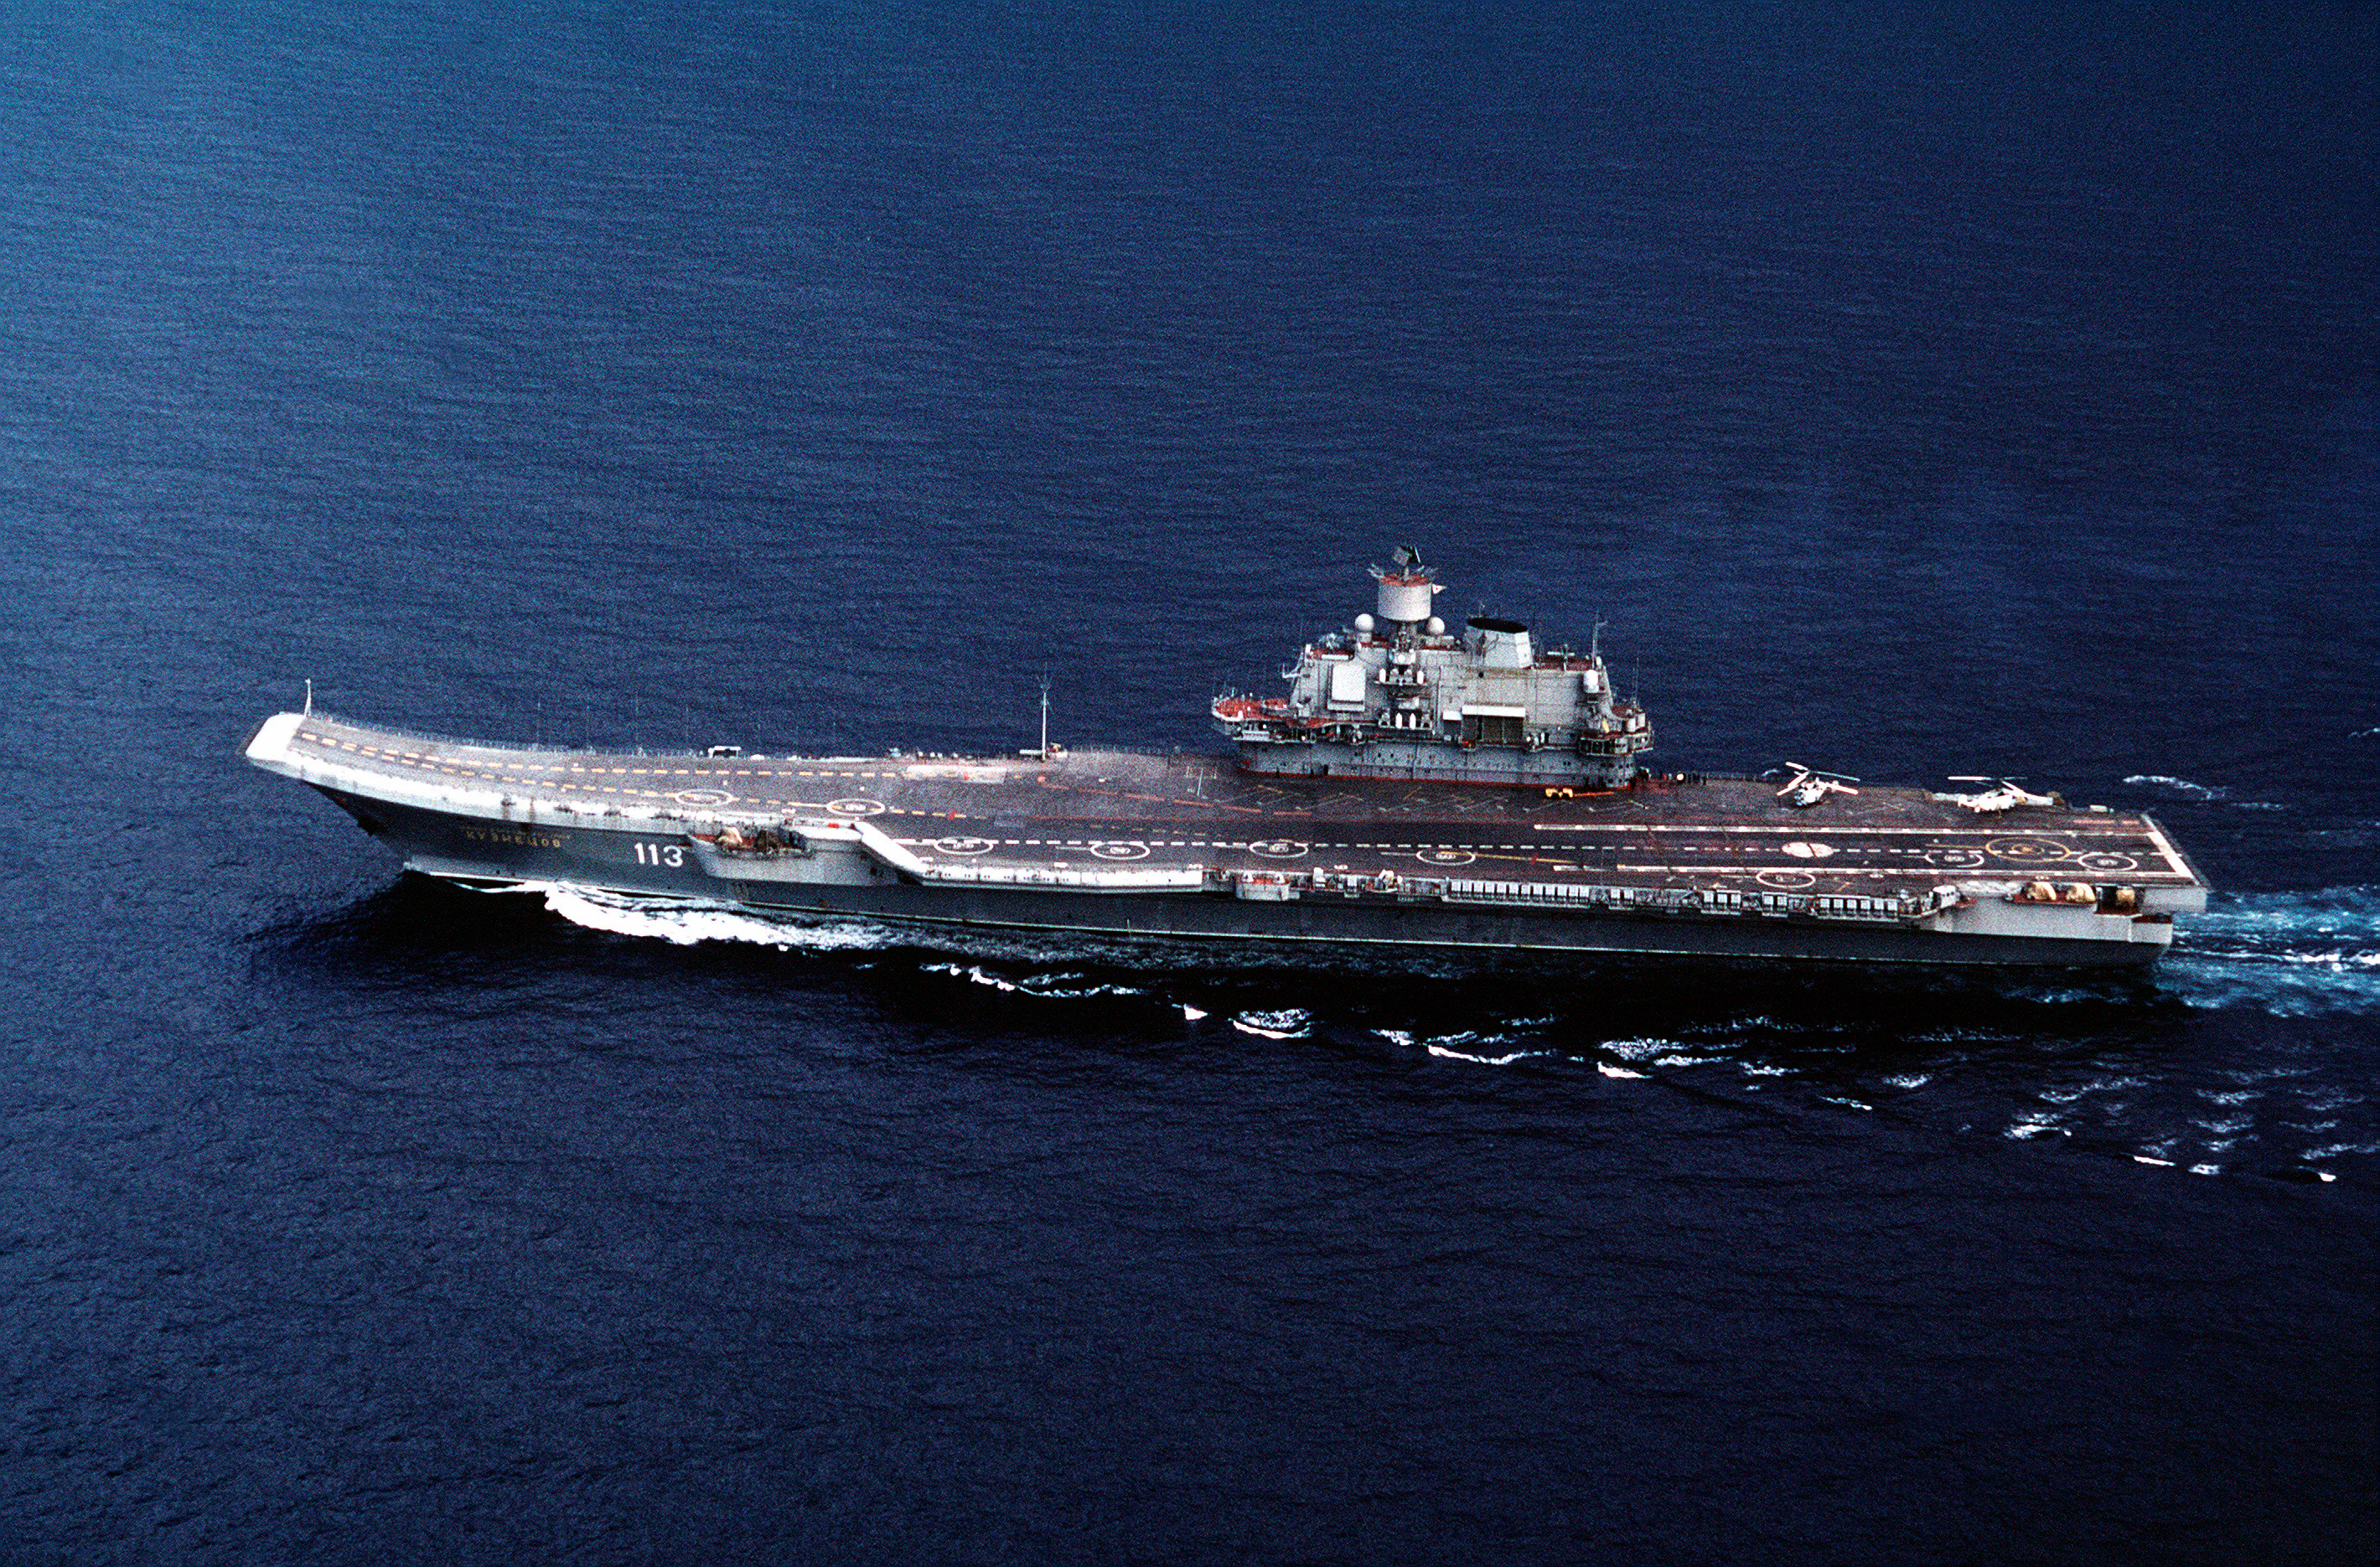 Admiral Kusnzov